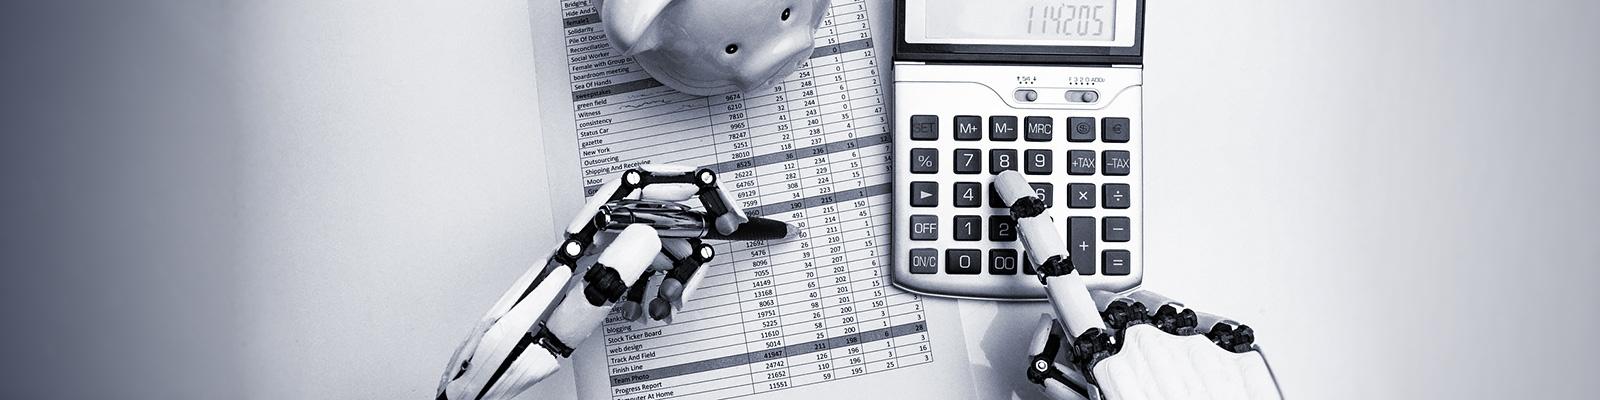 AI お金 計算 事務 イメージ